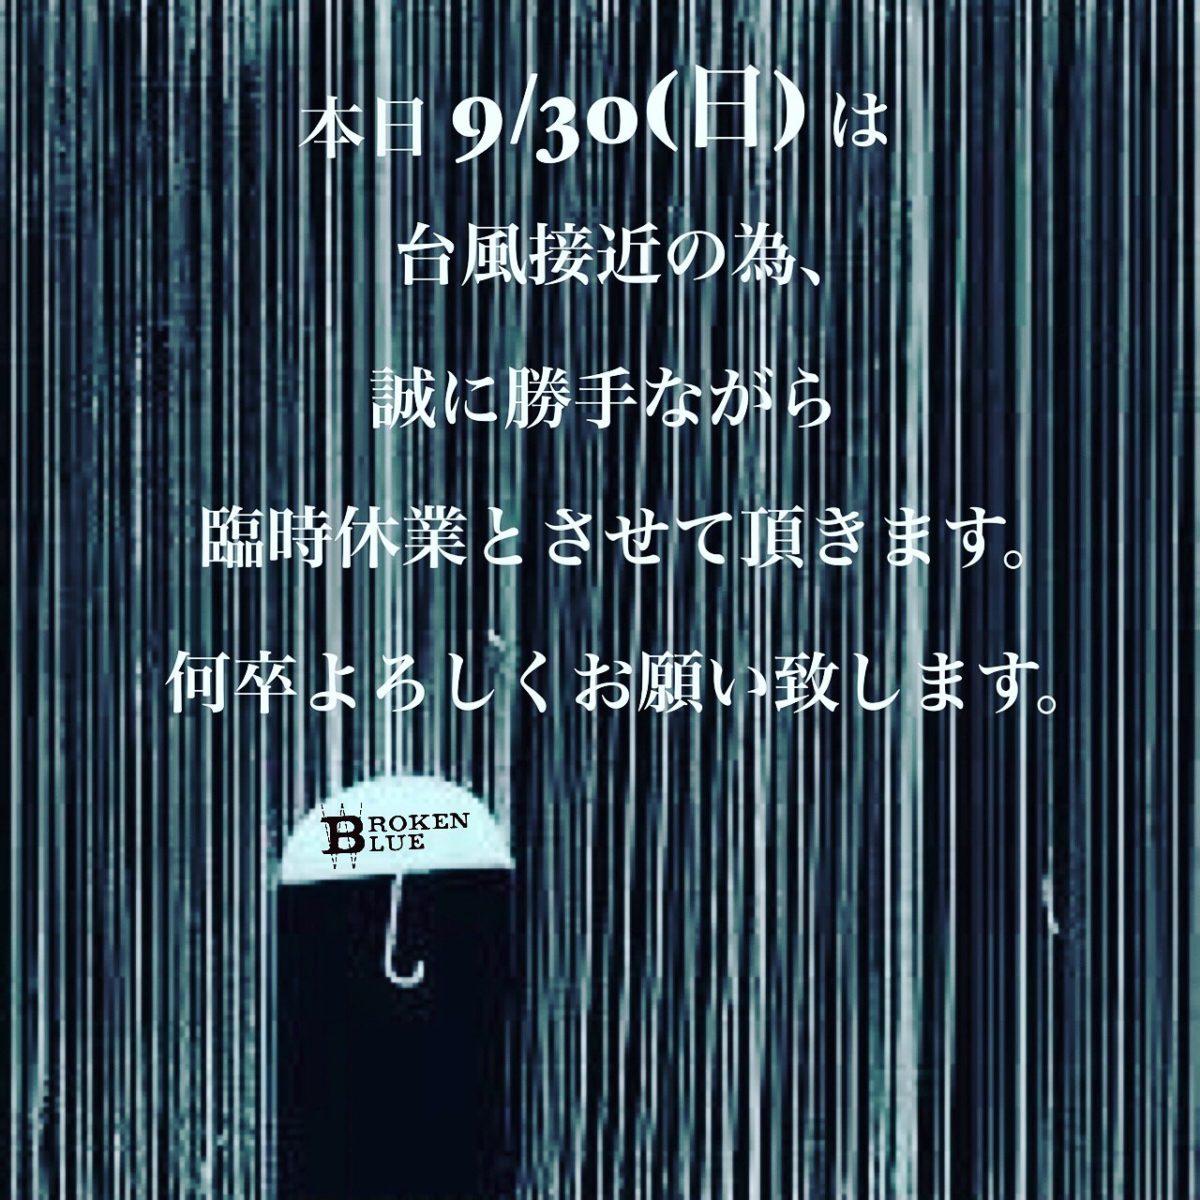 7101AB4C-1751-44FD-A509-40008518AA80